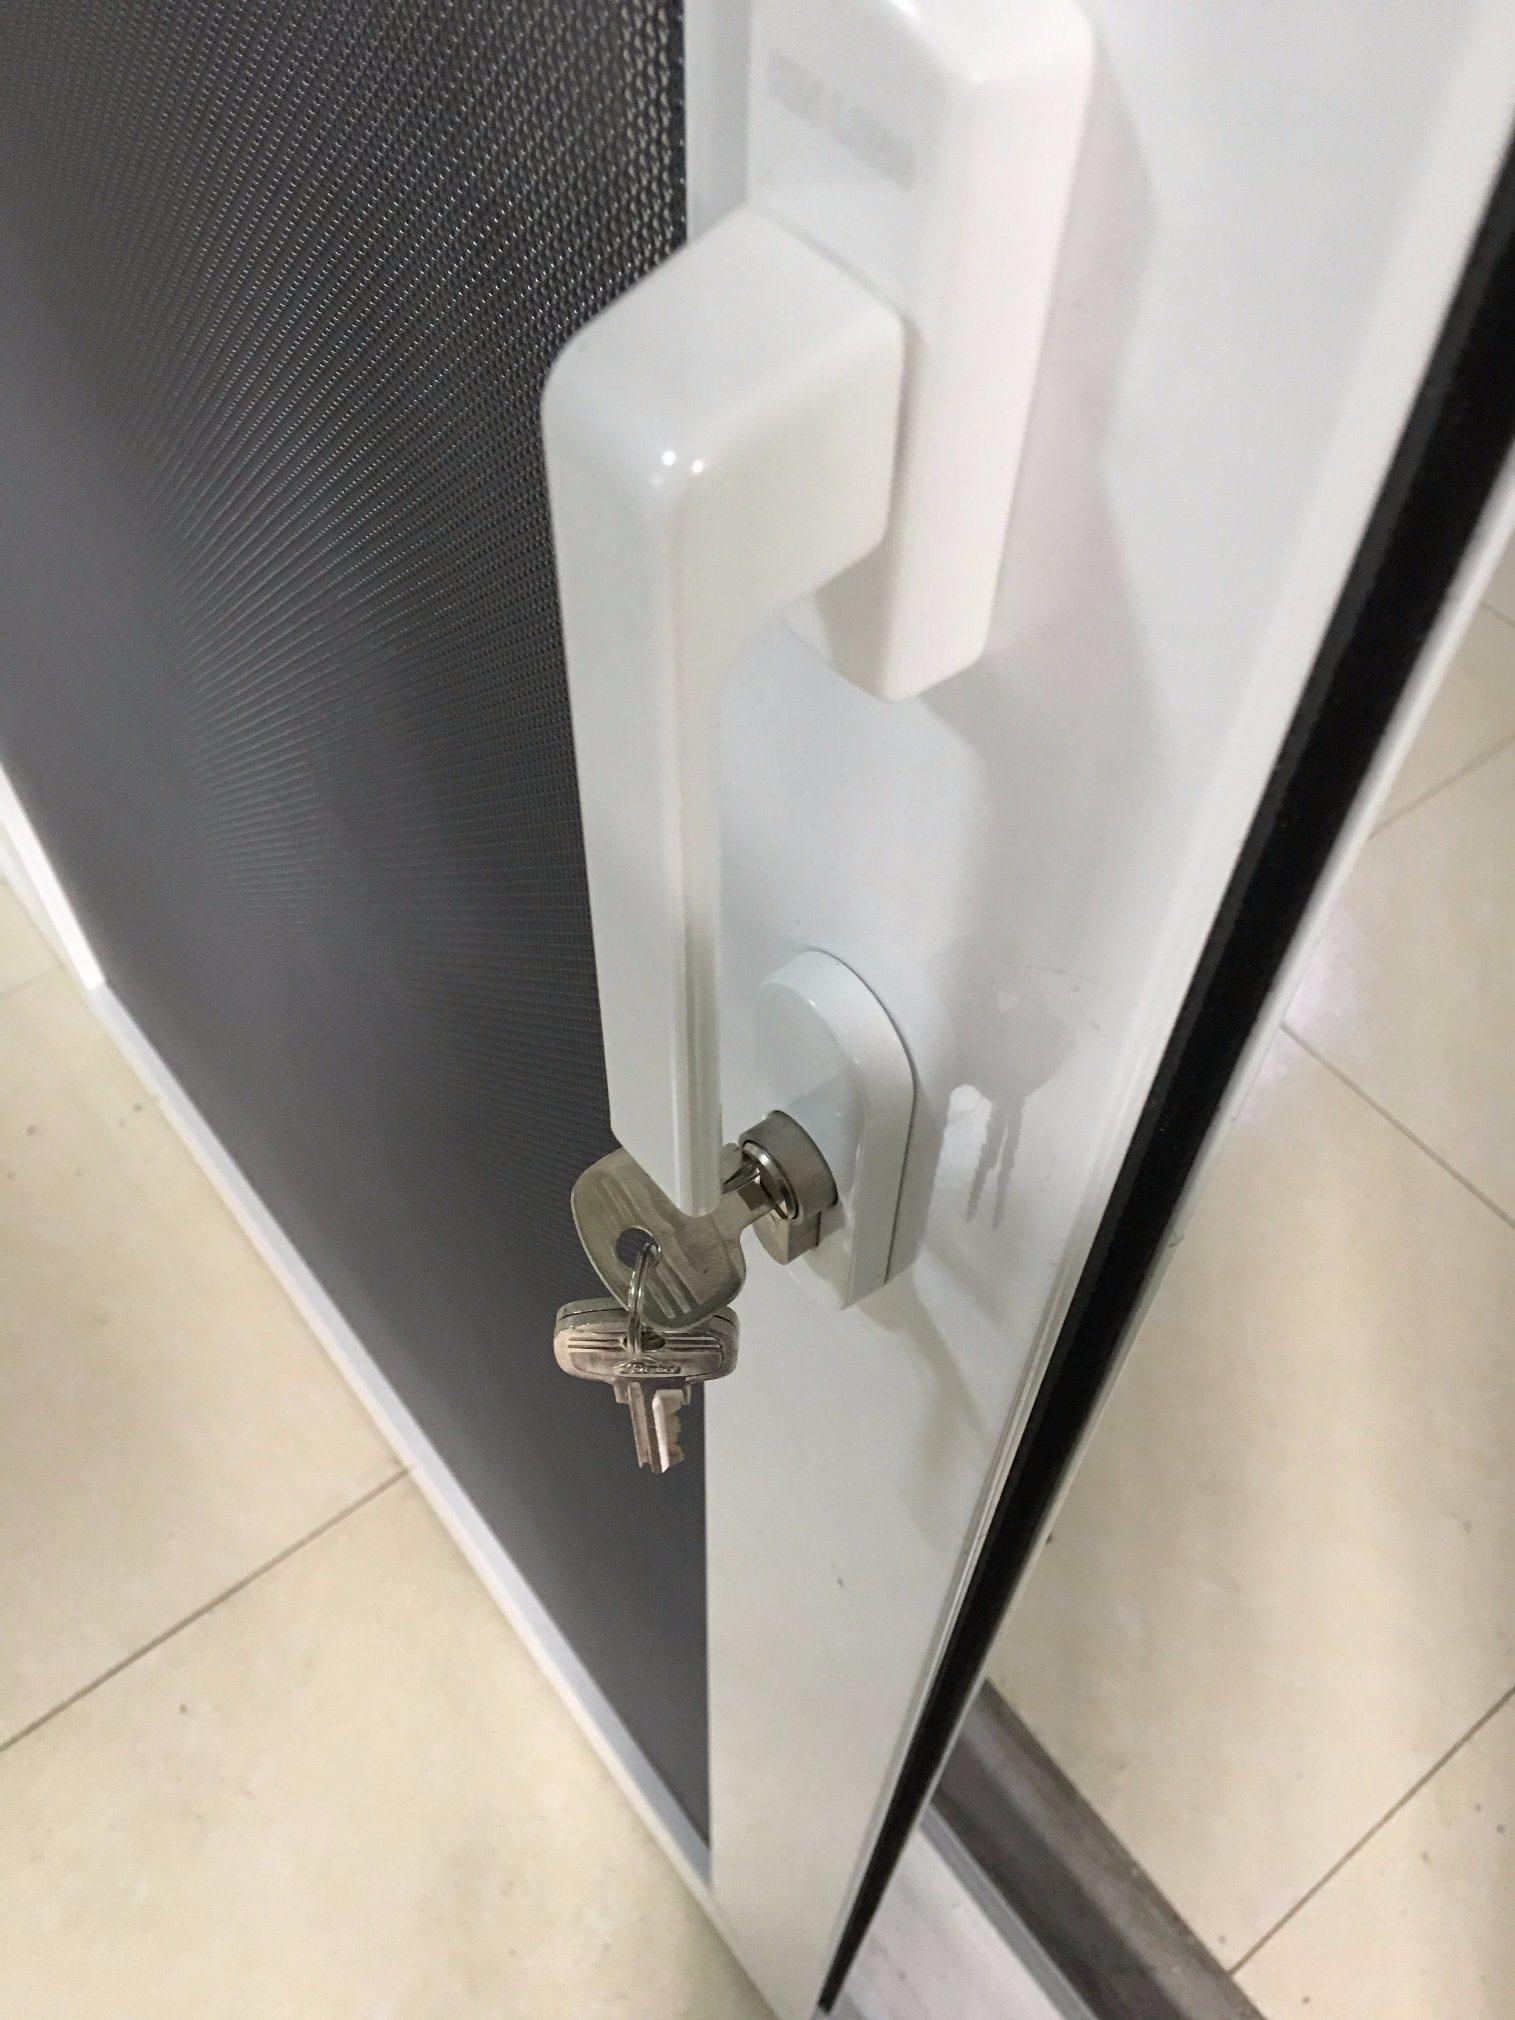 China Pvc 3 Track Sliding Door Australia Standard Sliding Glass